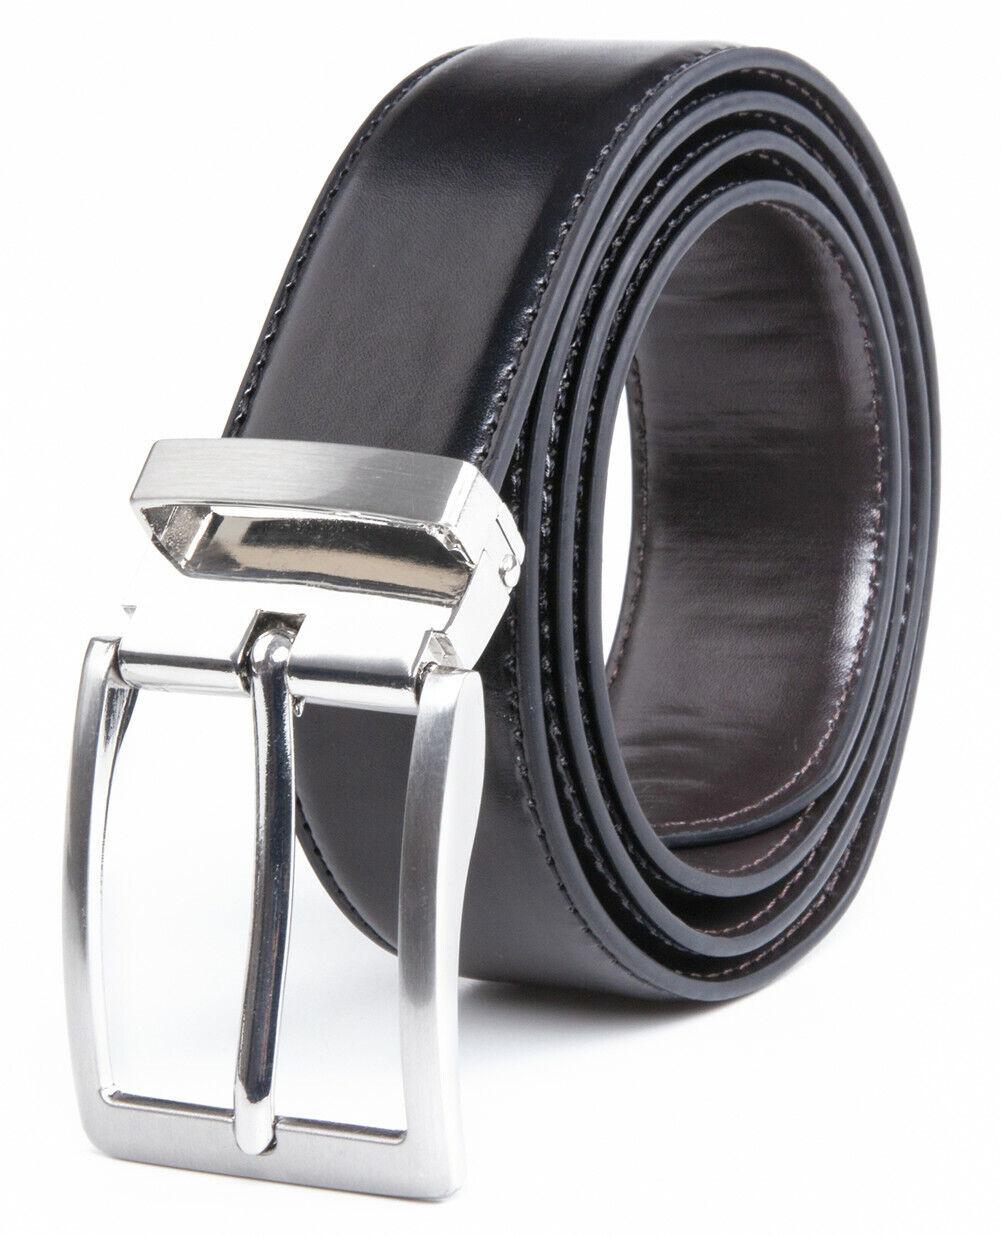 Men's Reversible Belt with Dress Buckle Belt for Men,One Belt with 2 colors Belts